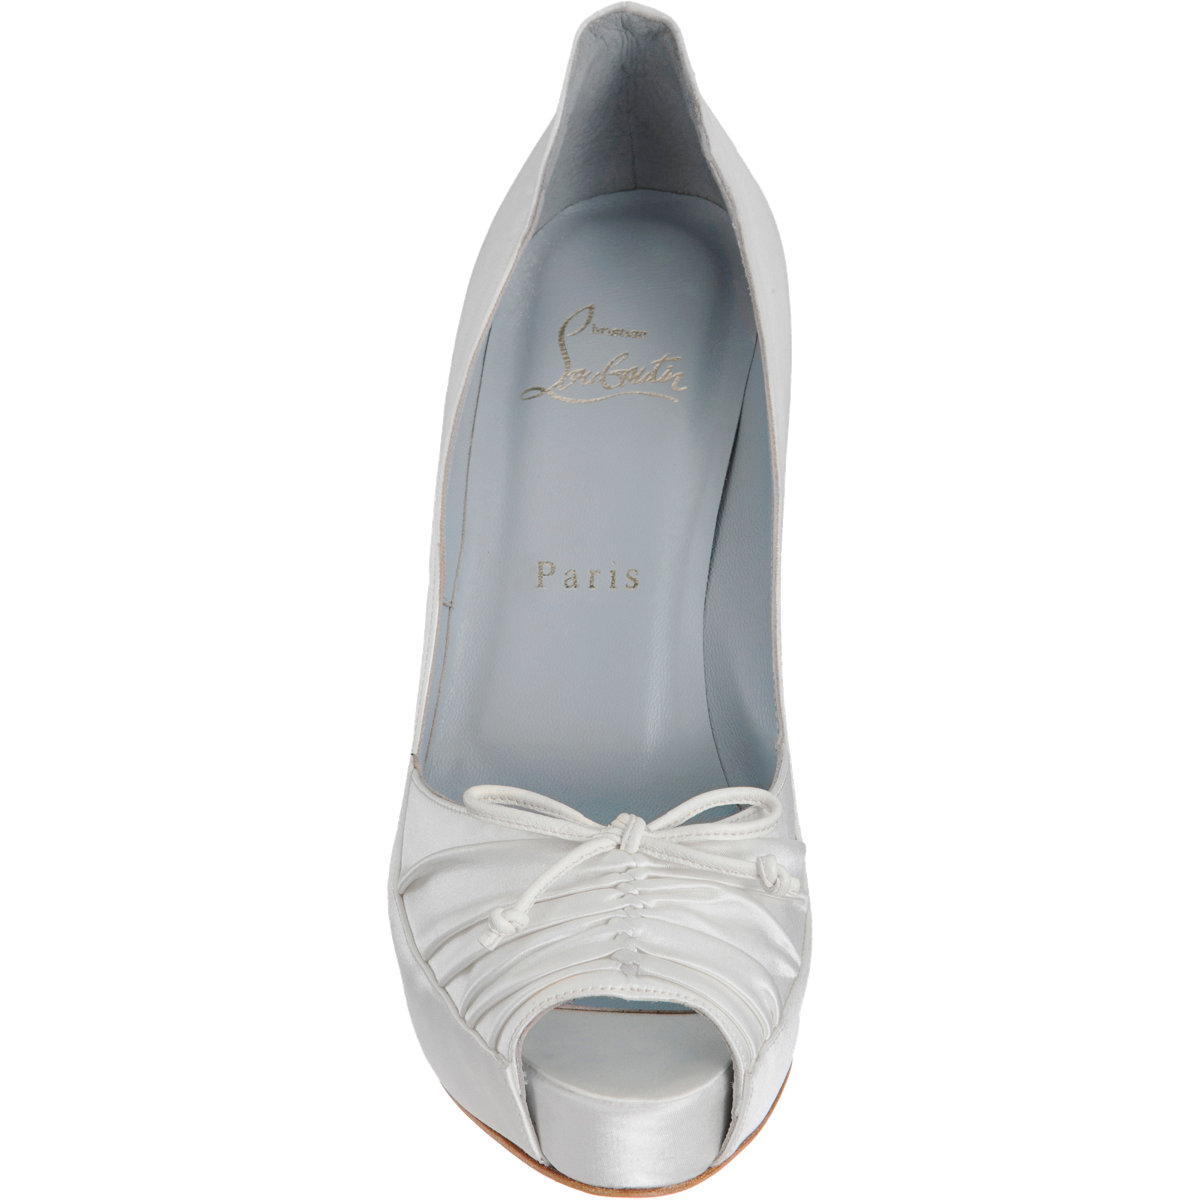 christian louboutin imitation shoes - Christian louboutin Very Pli in White | Lyst